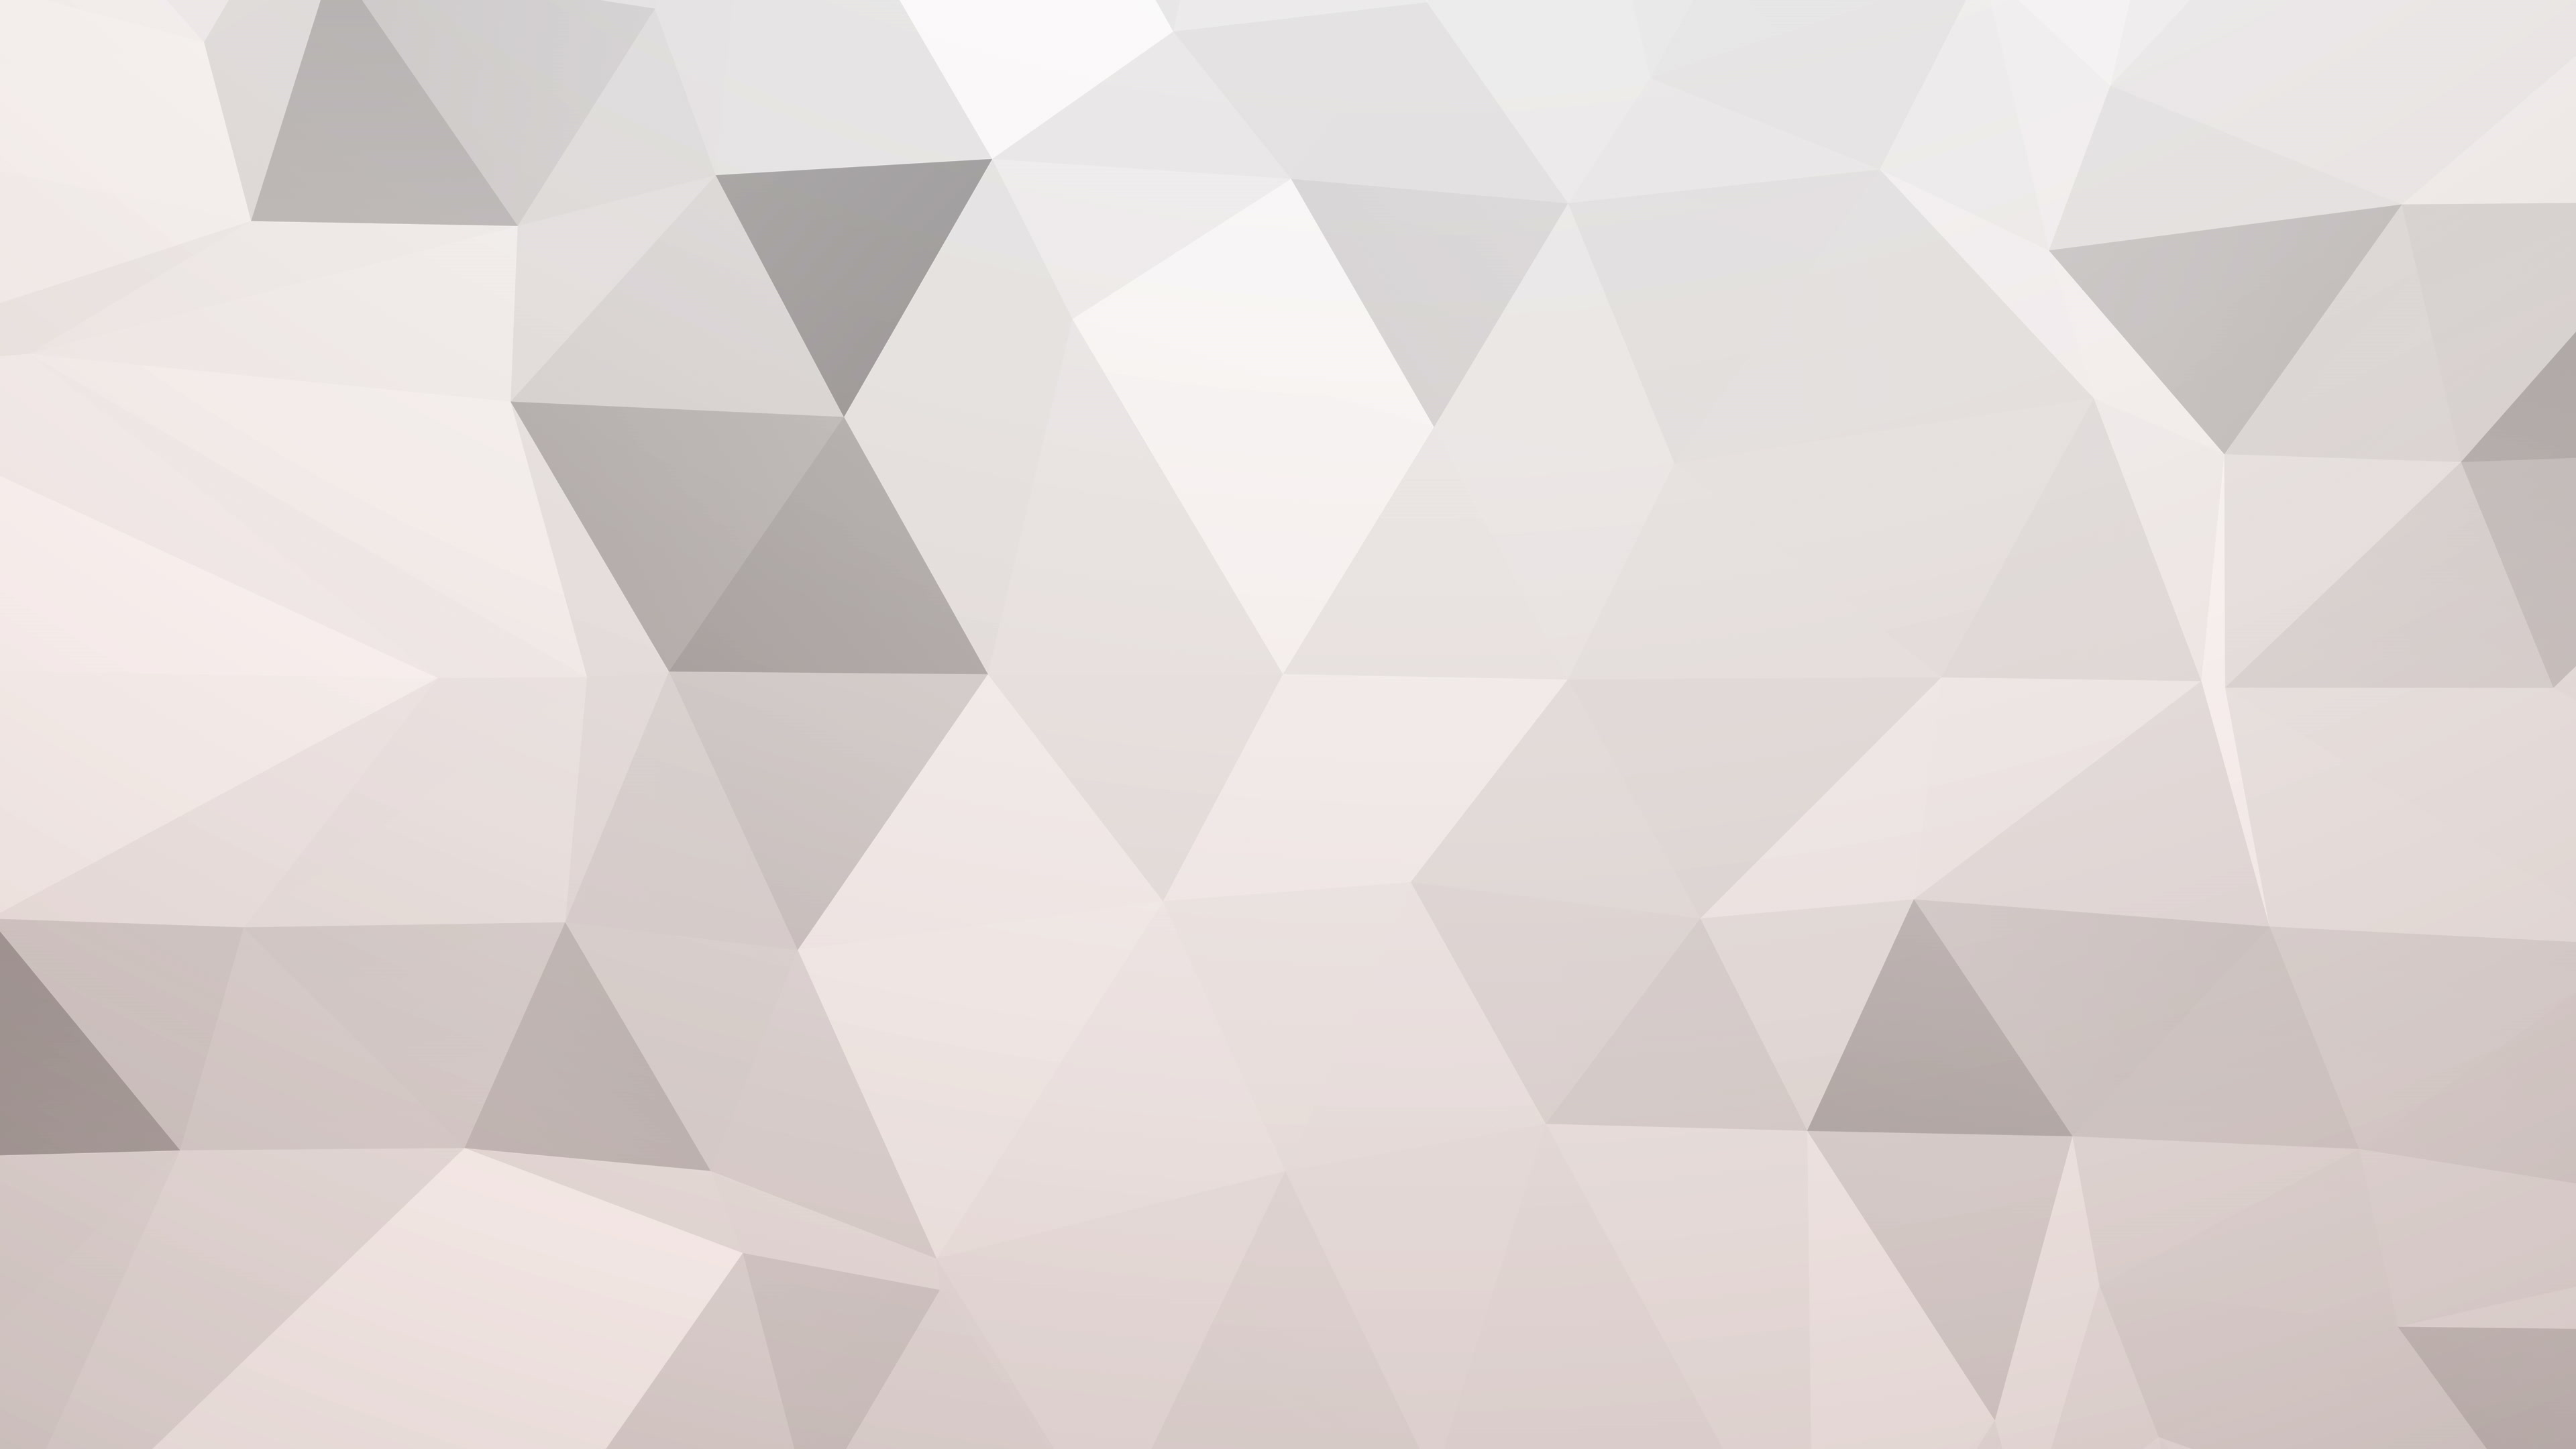 triangles-background-modern-background-loop-footage-071486296_prevstill (1)